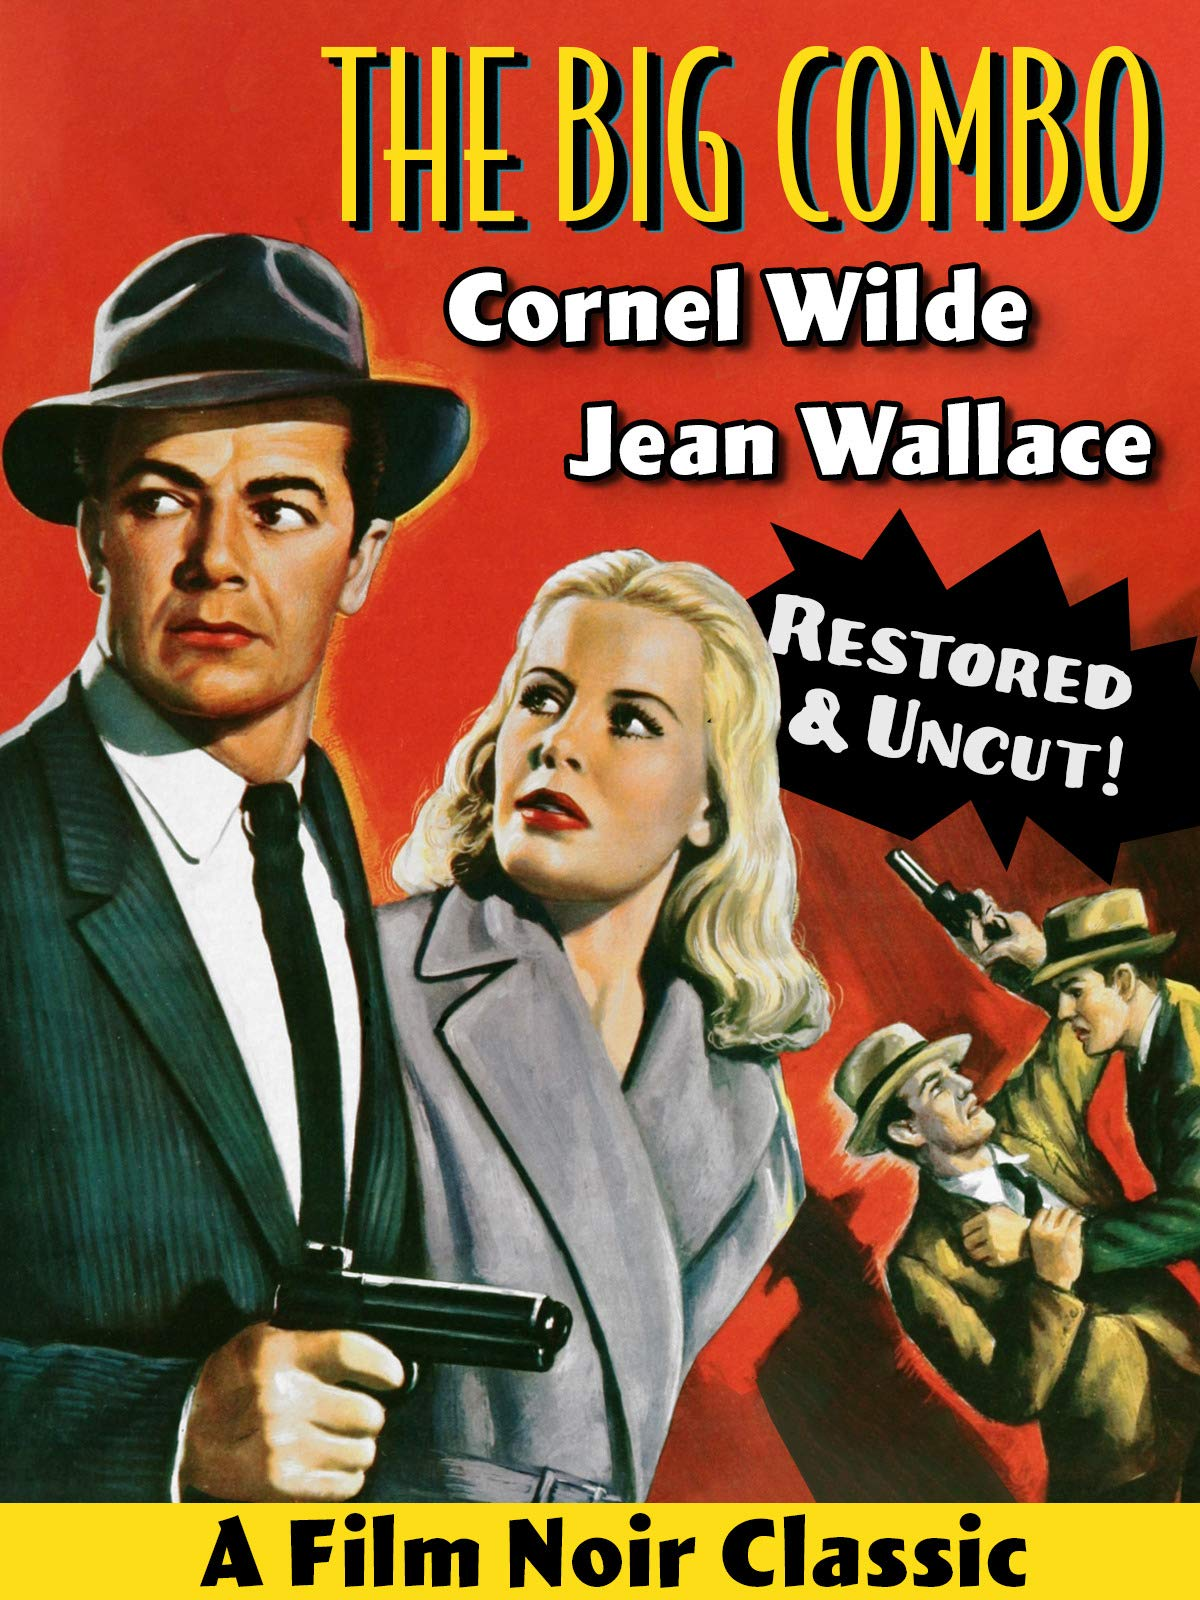 The Big Combo - Cornel Wilde, Richard Conte, A Film Noir Classic, Restored & Uncut!